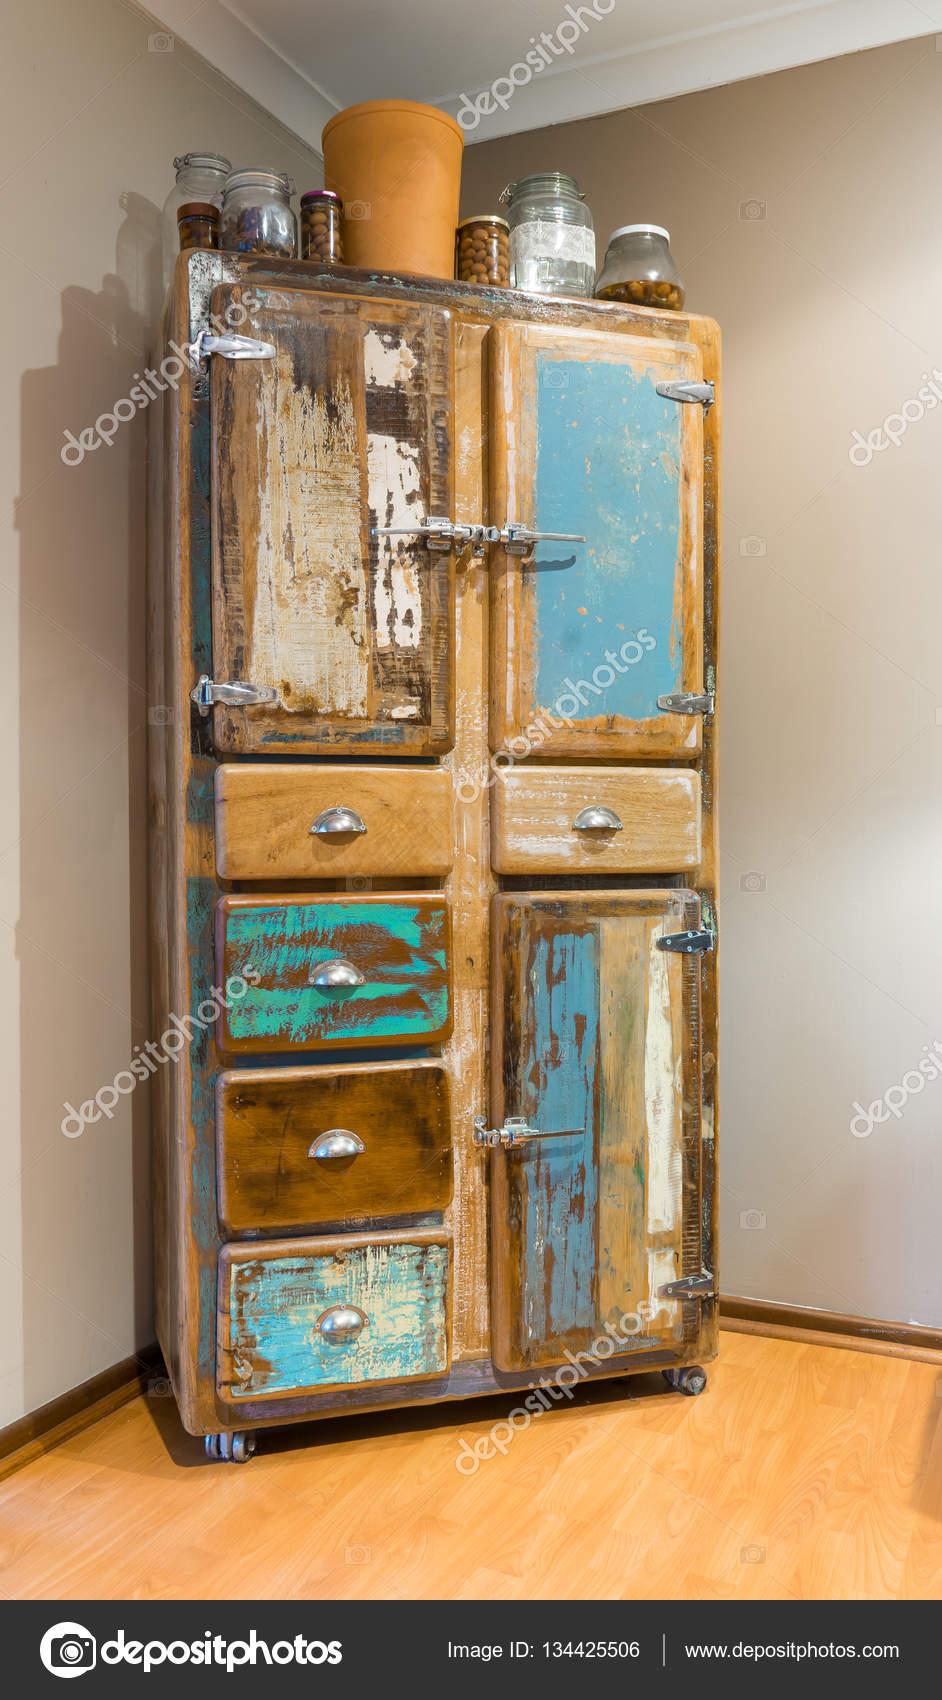 Armadio da cucina stile vintage — Foto Stock © jamesteohart #134425506